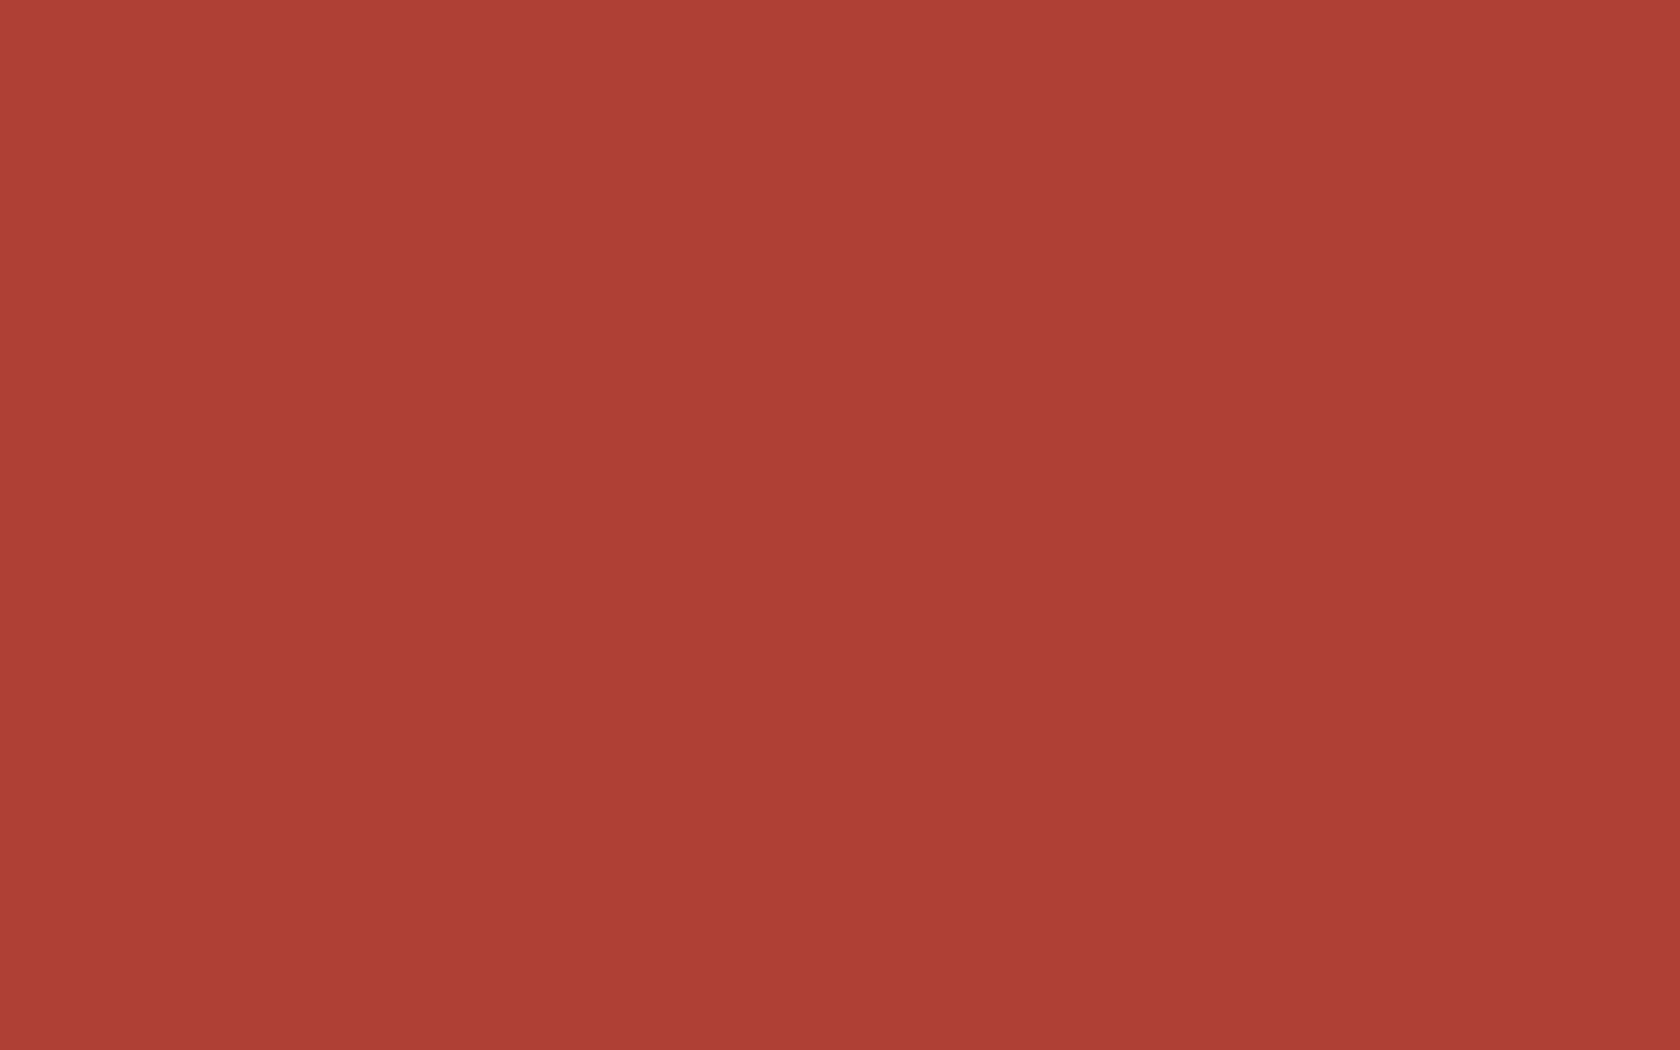 1680x1050 Medium Carmine Solid Color Background